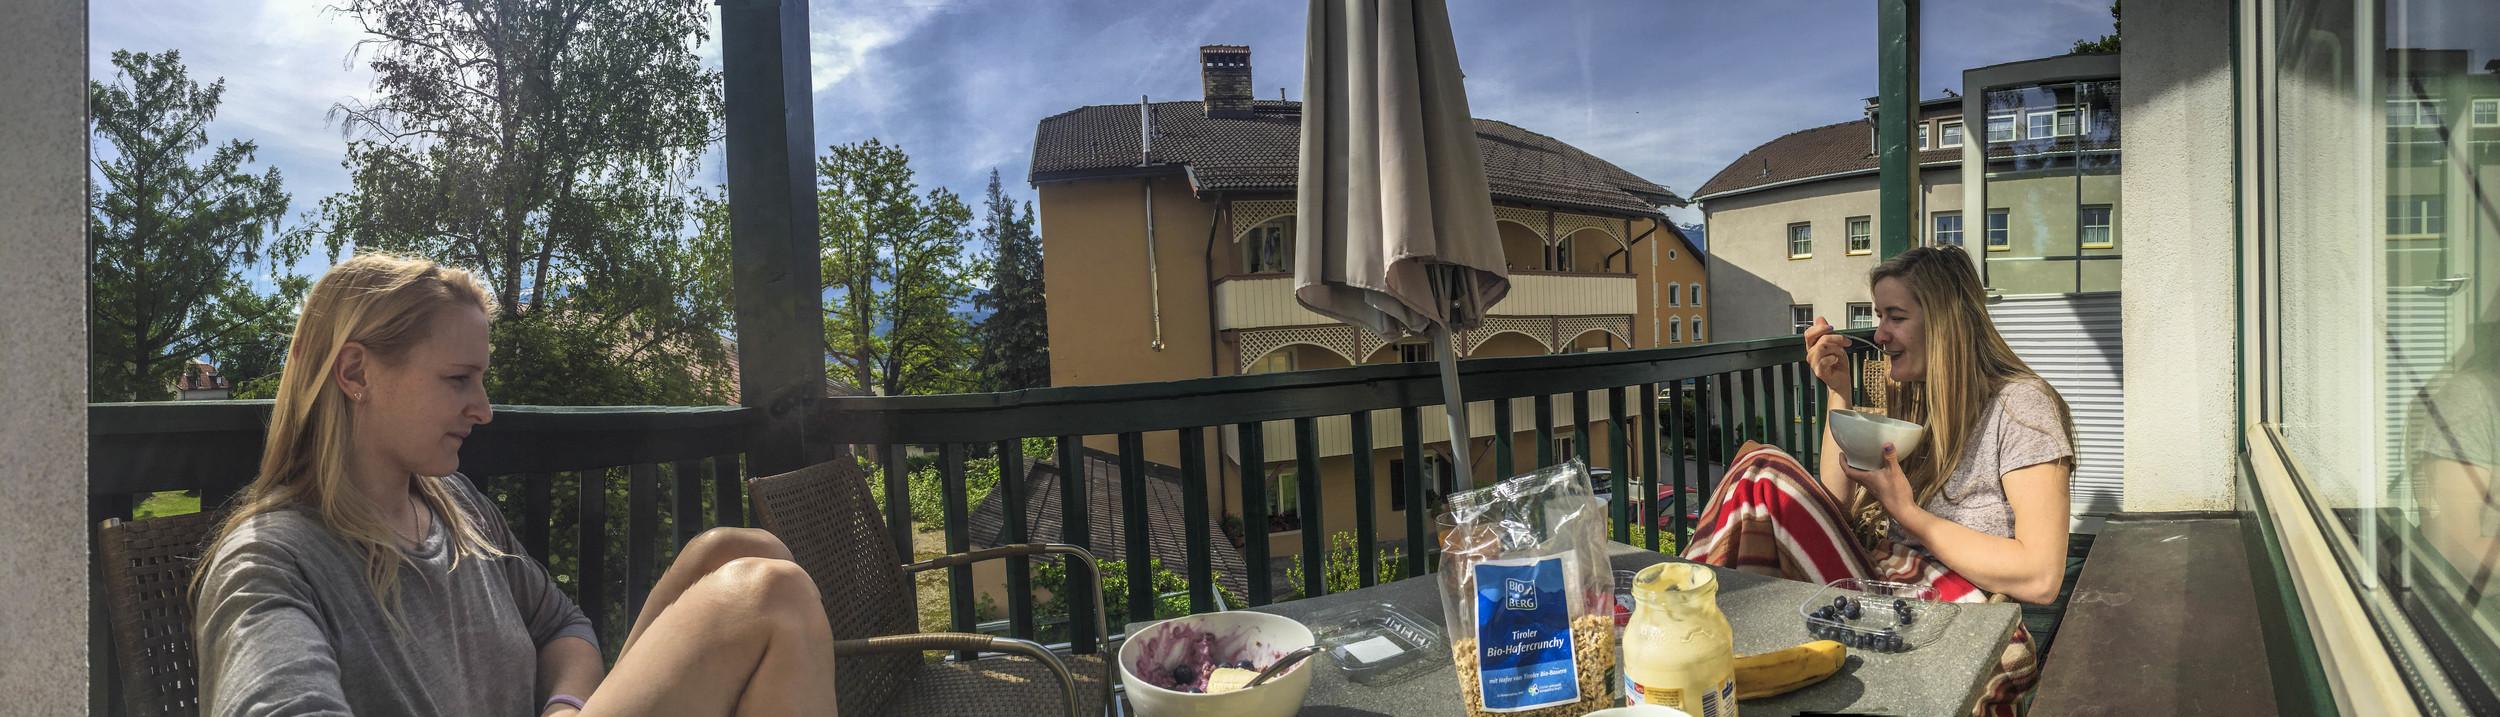 HAPPY COMPETITORS. Balcony breakfast.